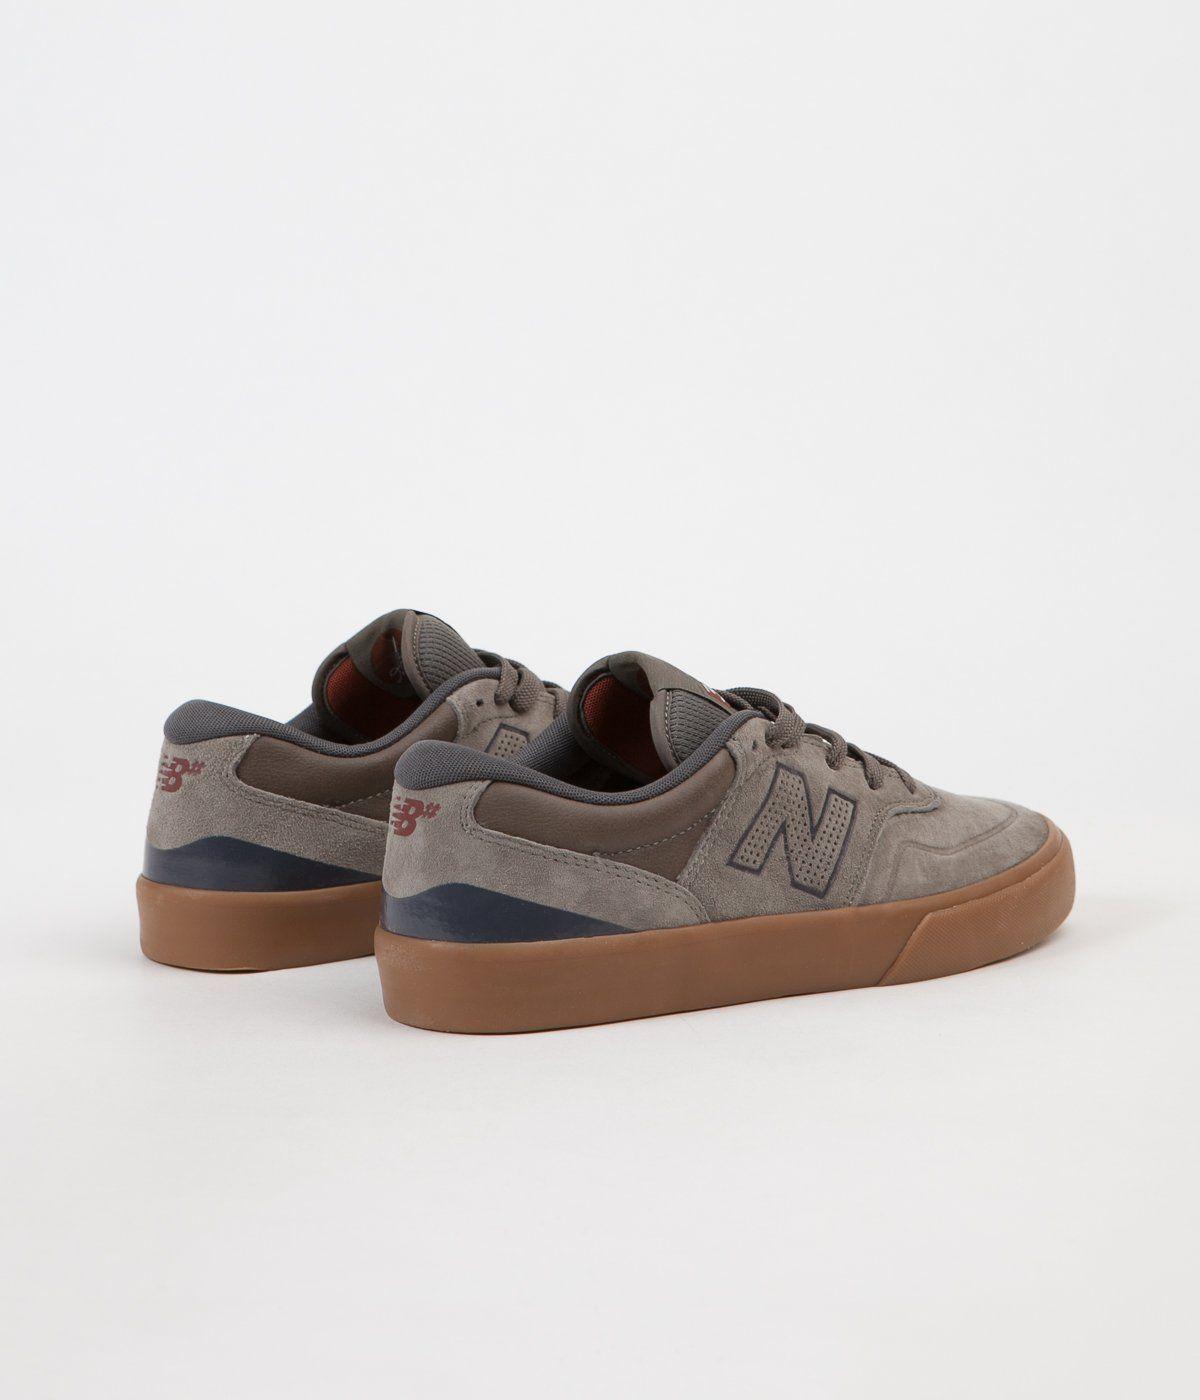 New Balance Numeric Arto 358 Shoes Olive Gum | Clothes